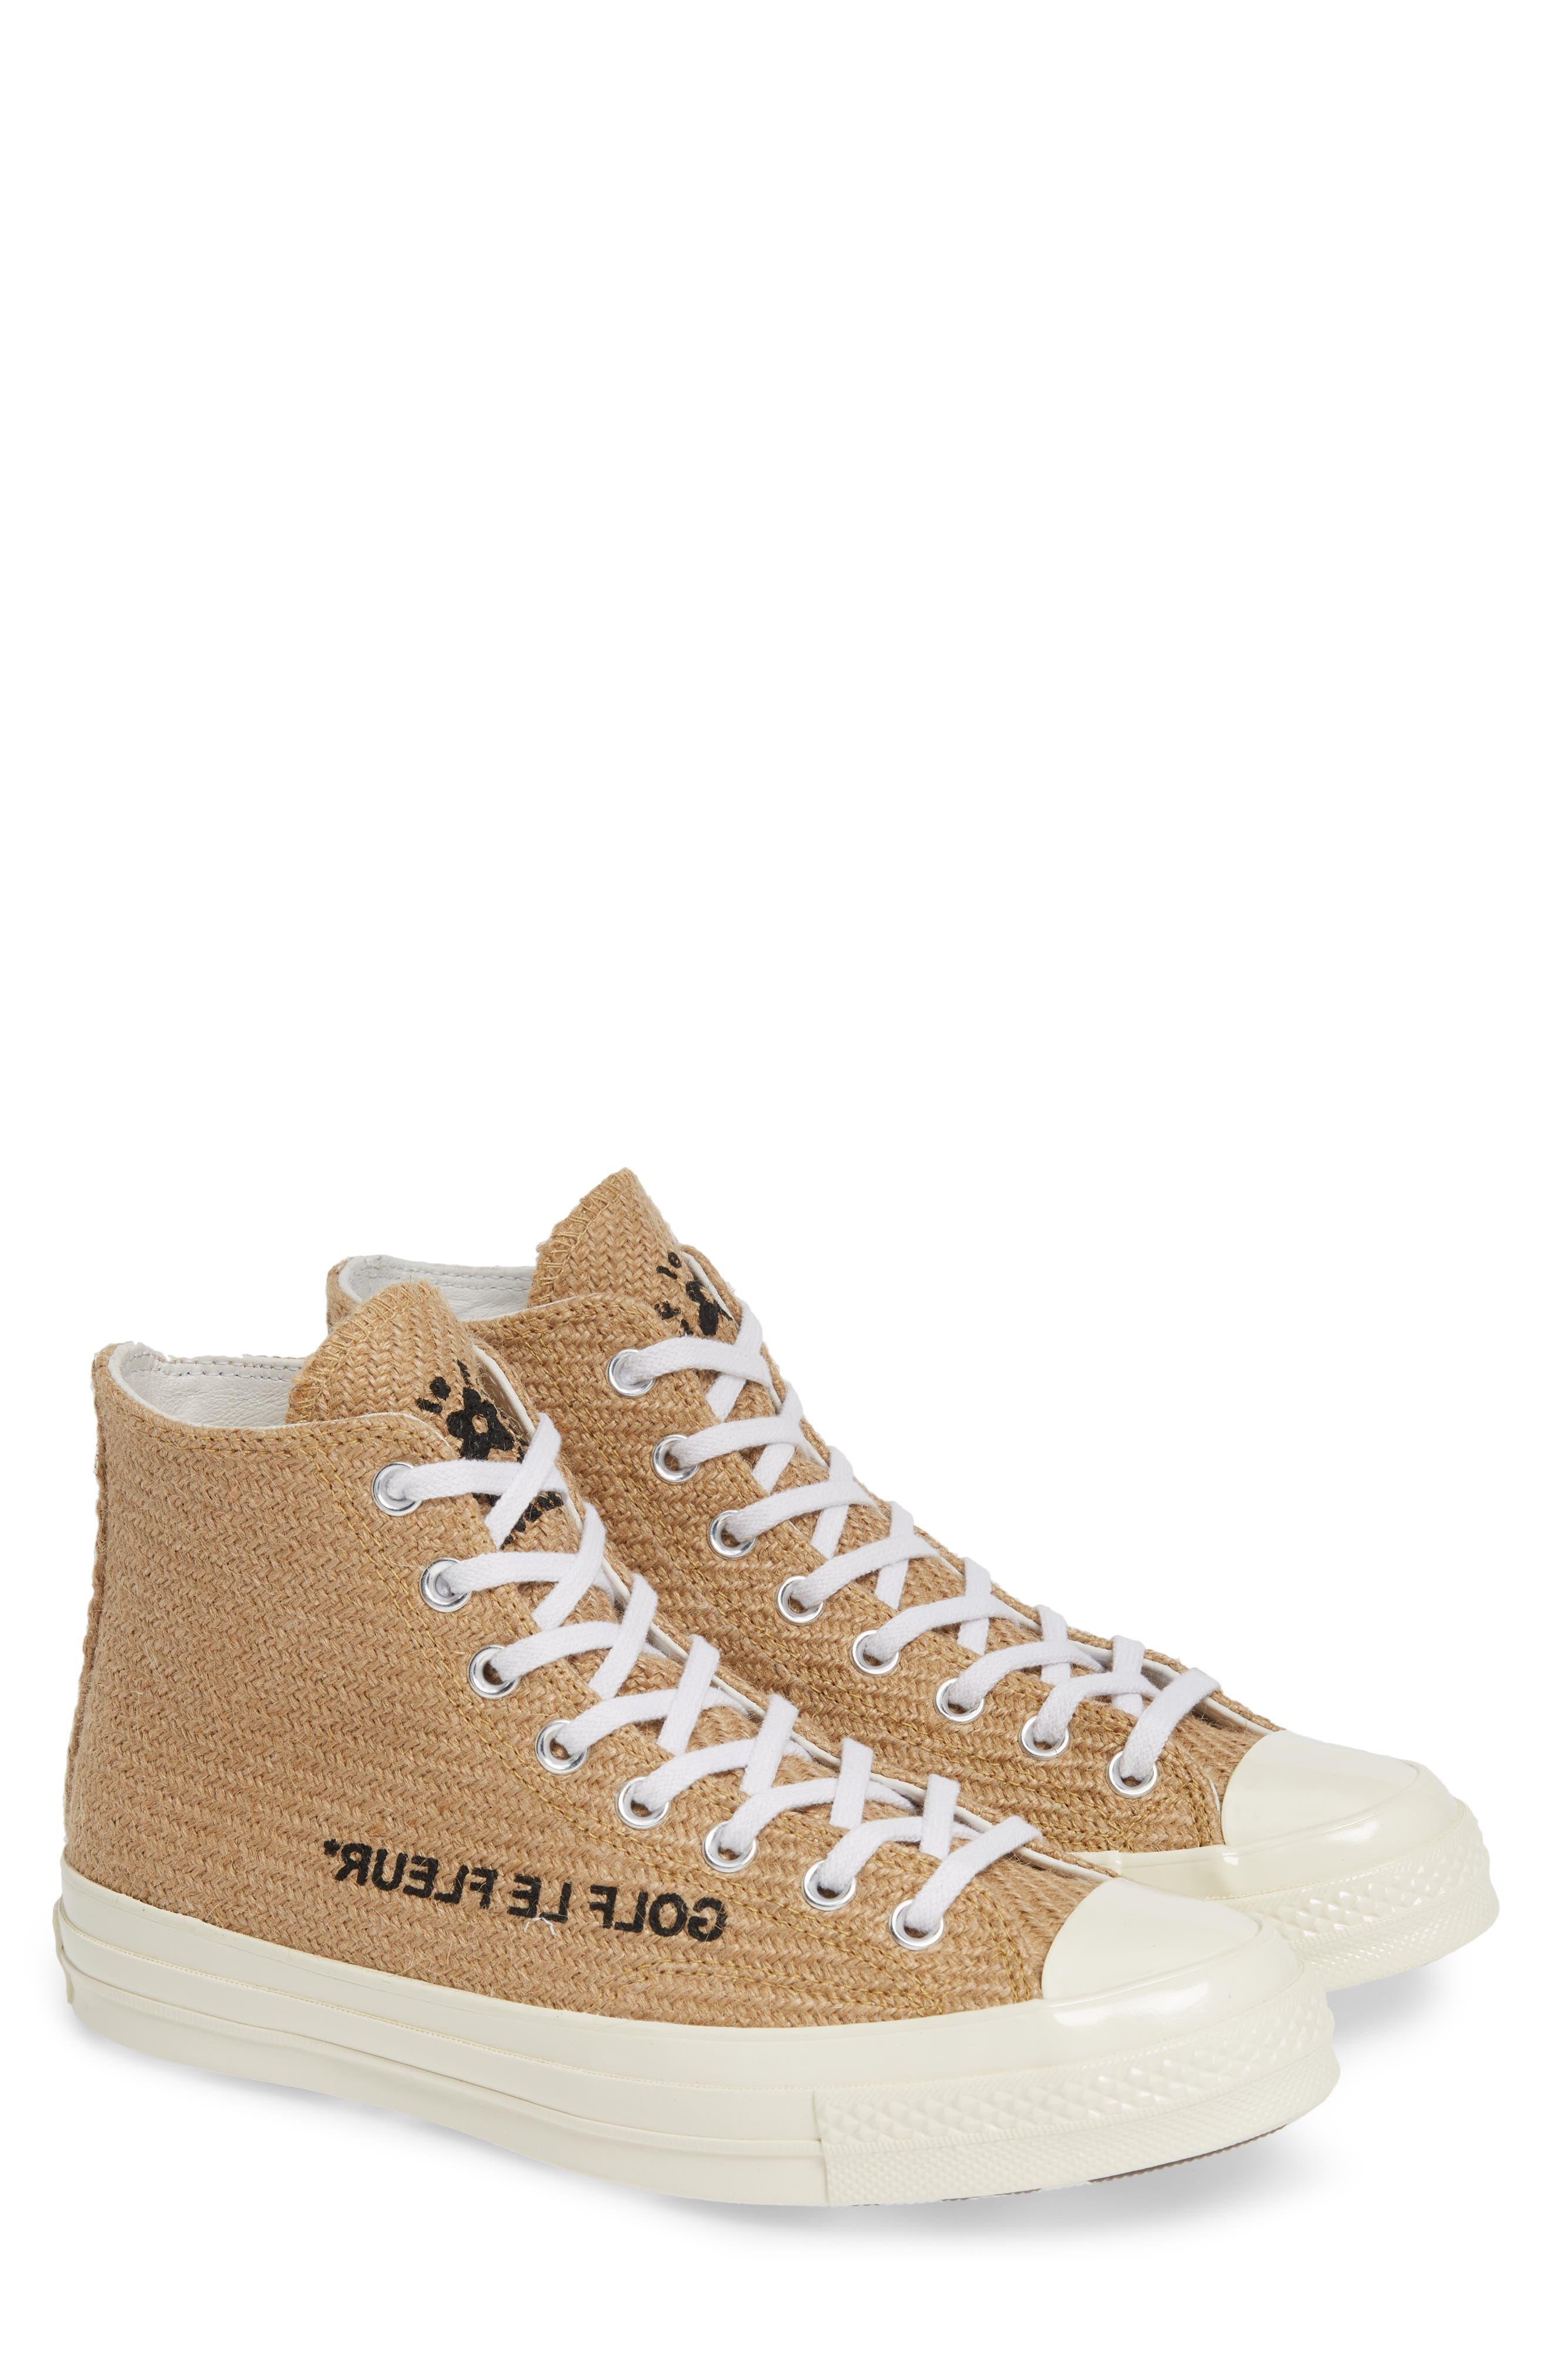 x GOLF le FLEUR* Chuck 70 High Top Sneaker,                             Main thumbnail 1, color,                             209